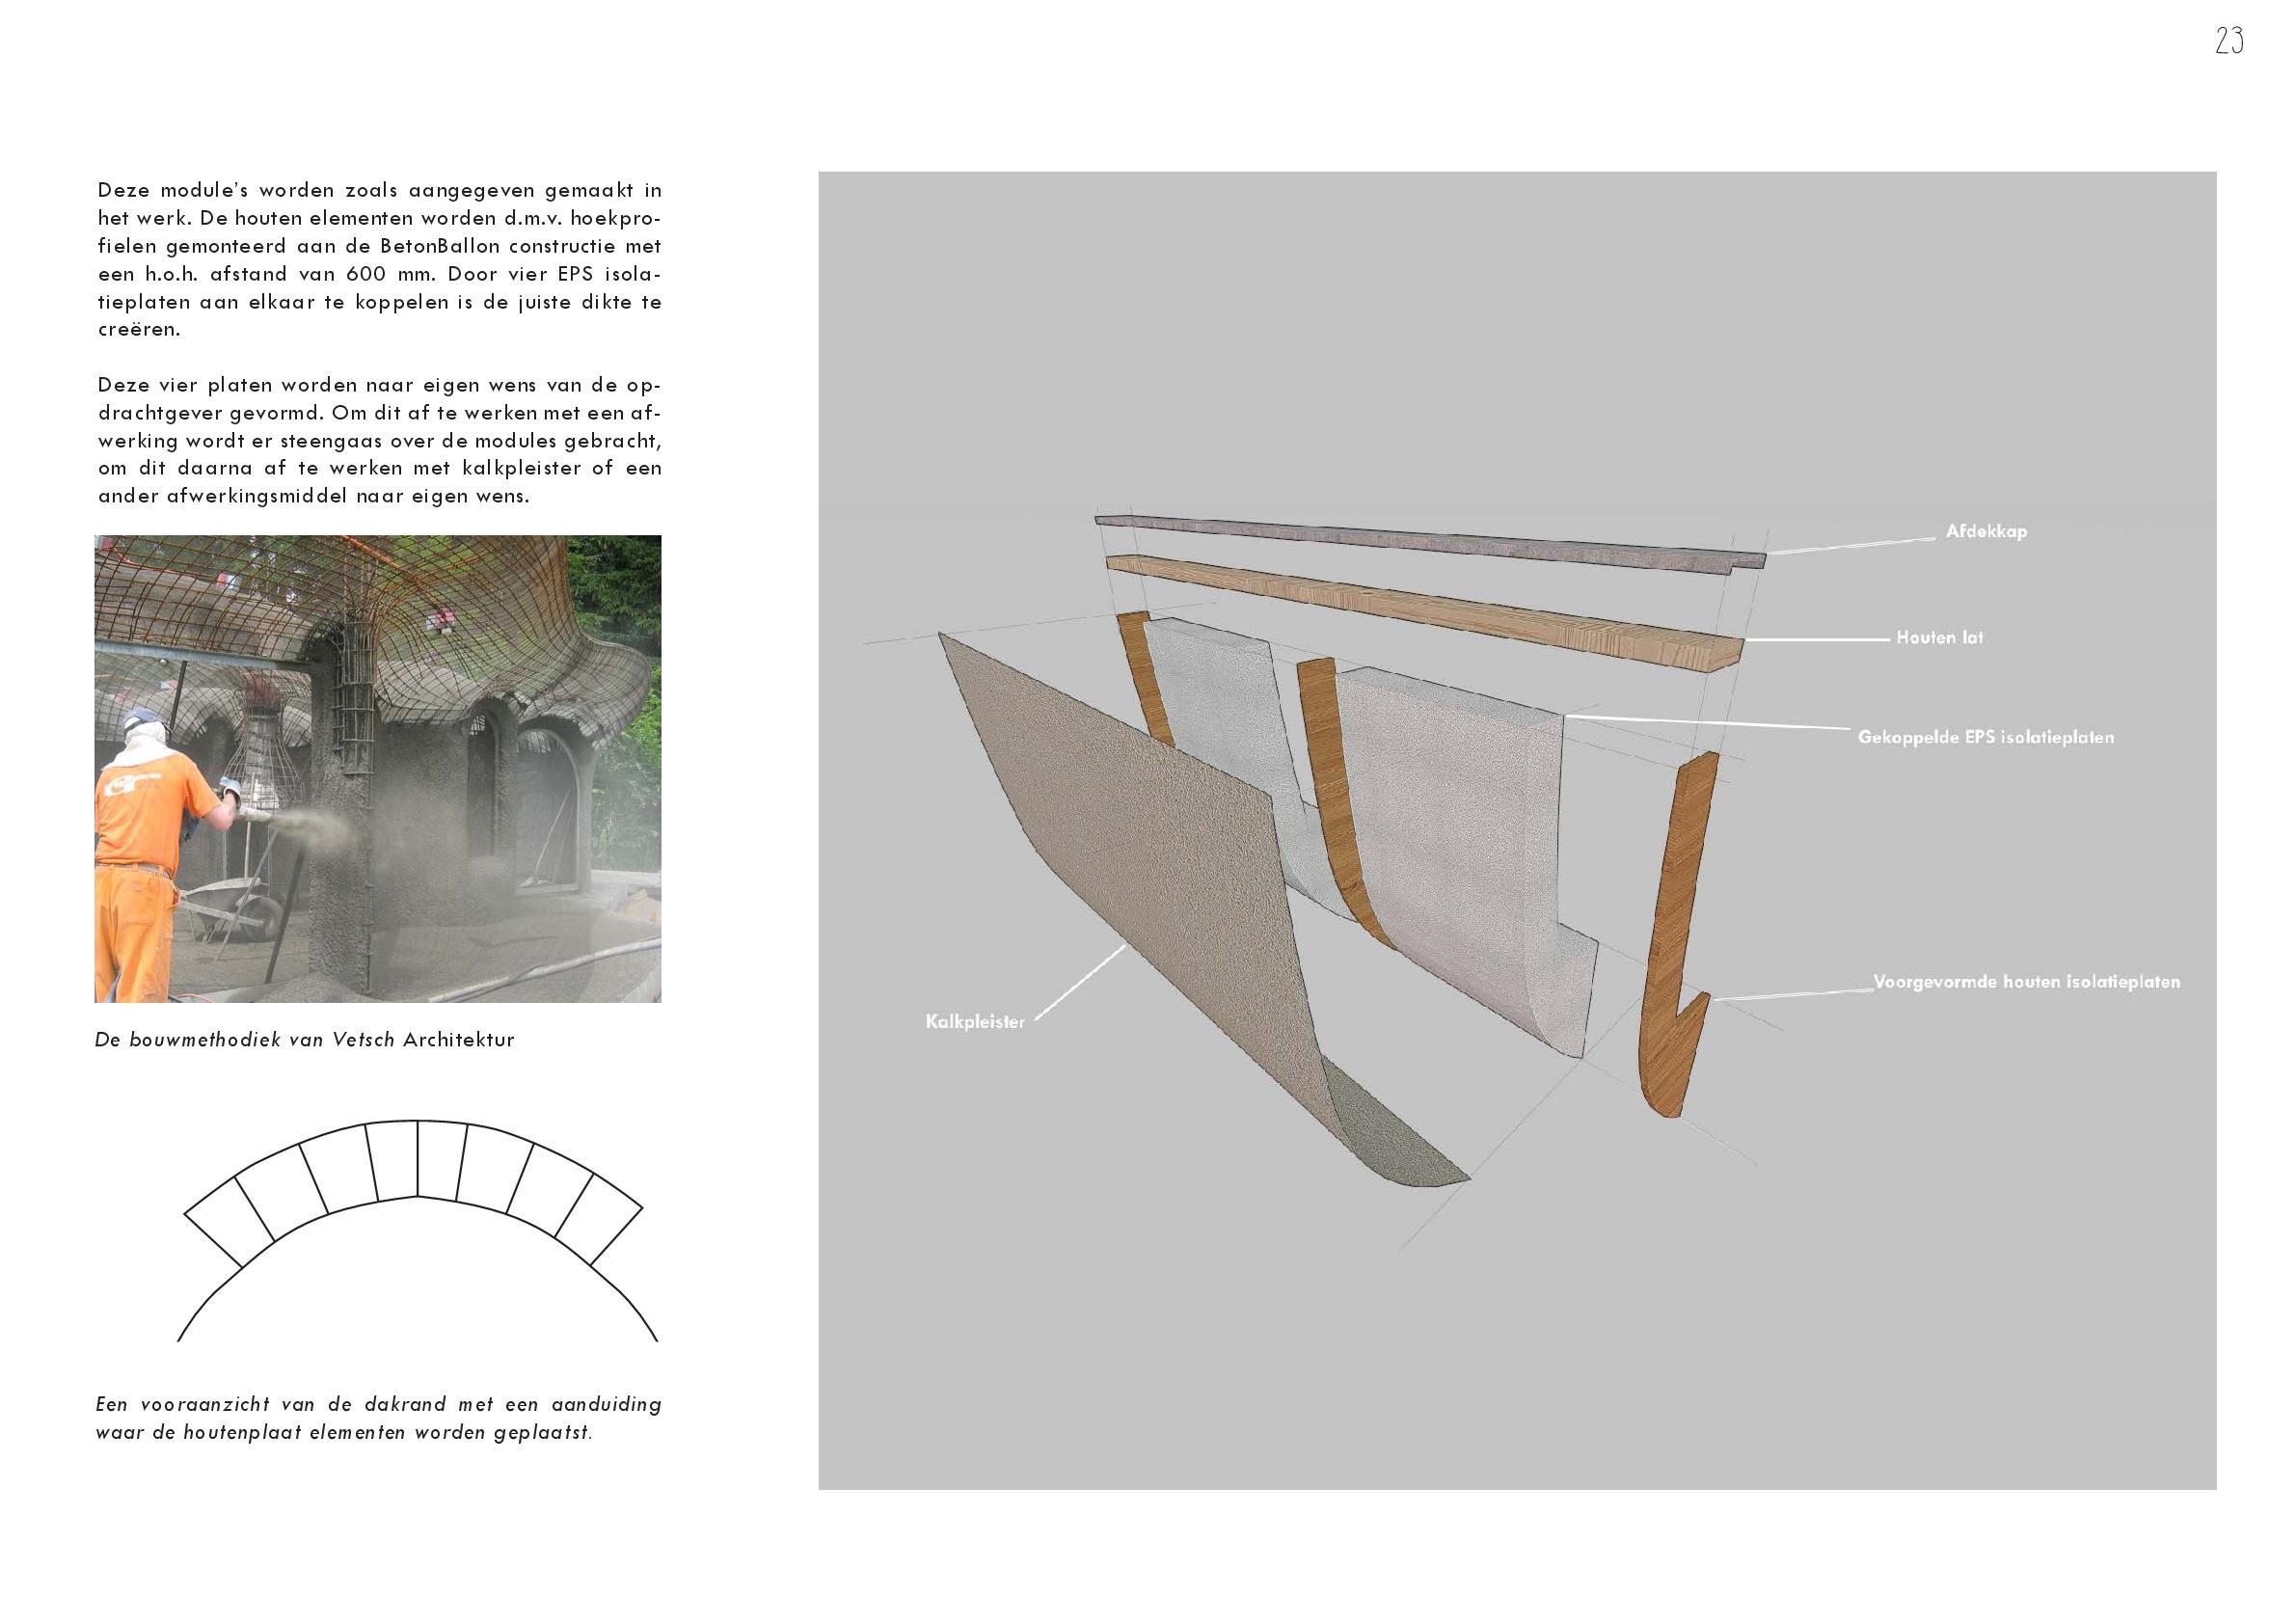 projectverslag-v2.8-inlever-023